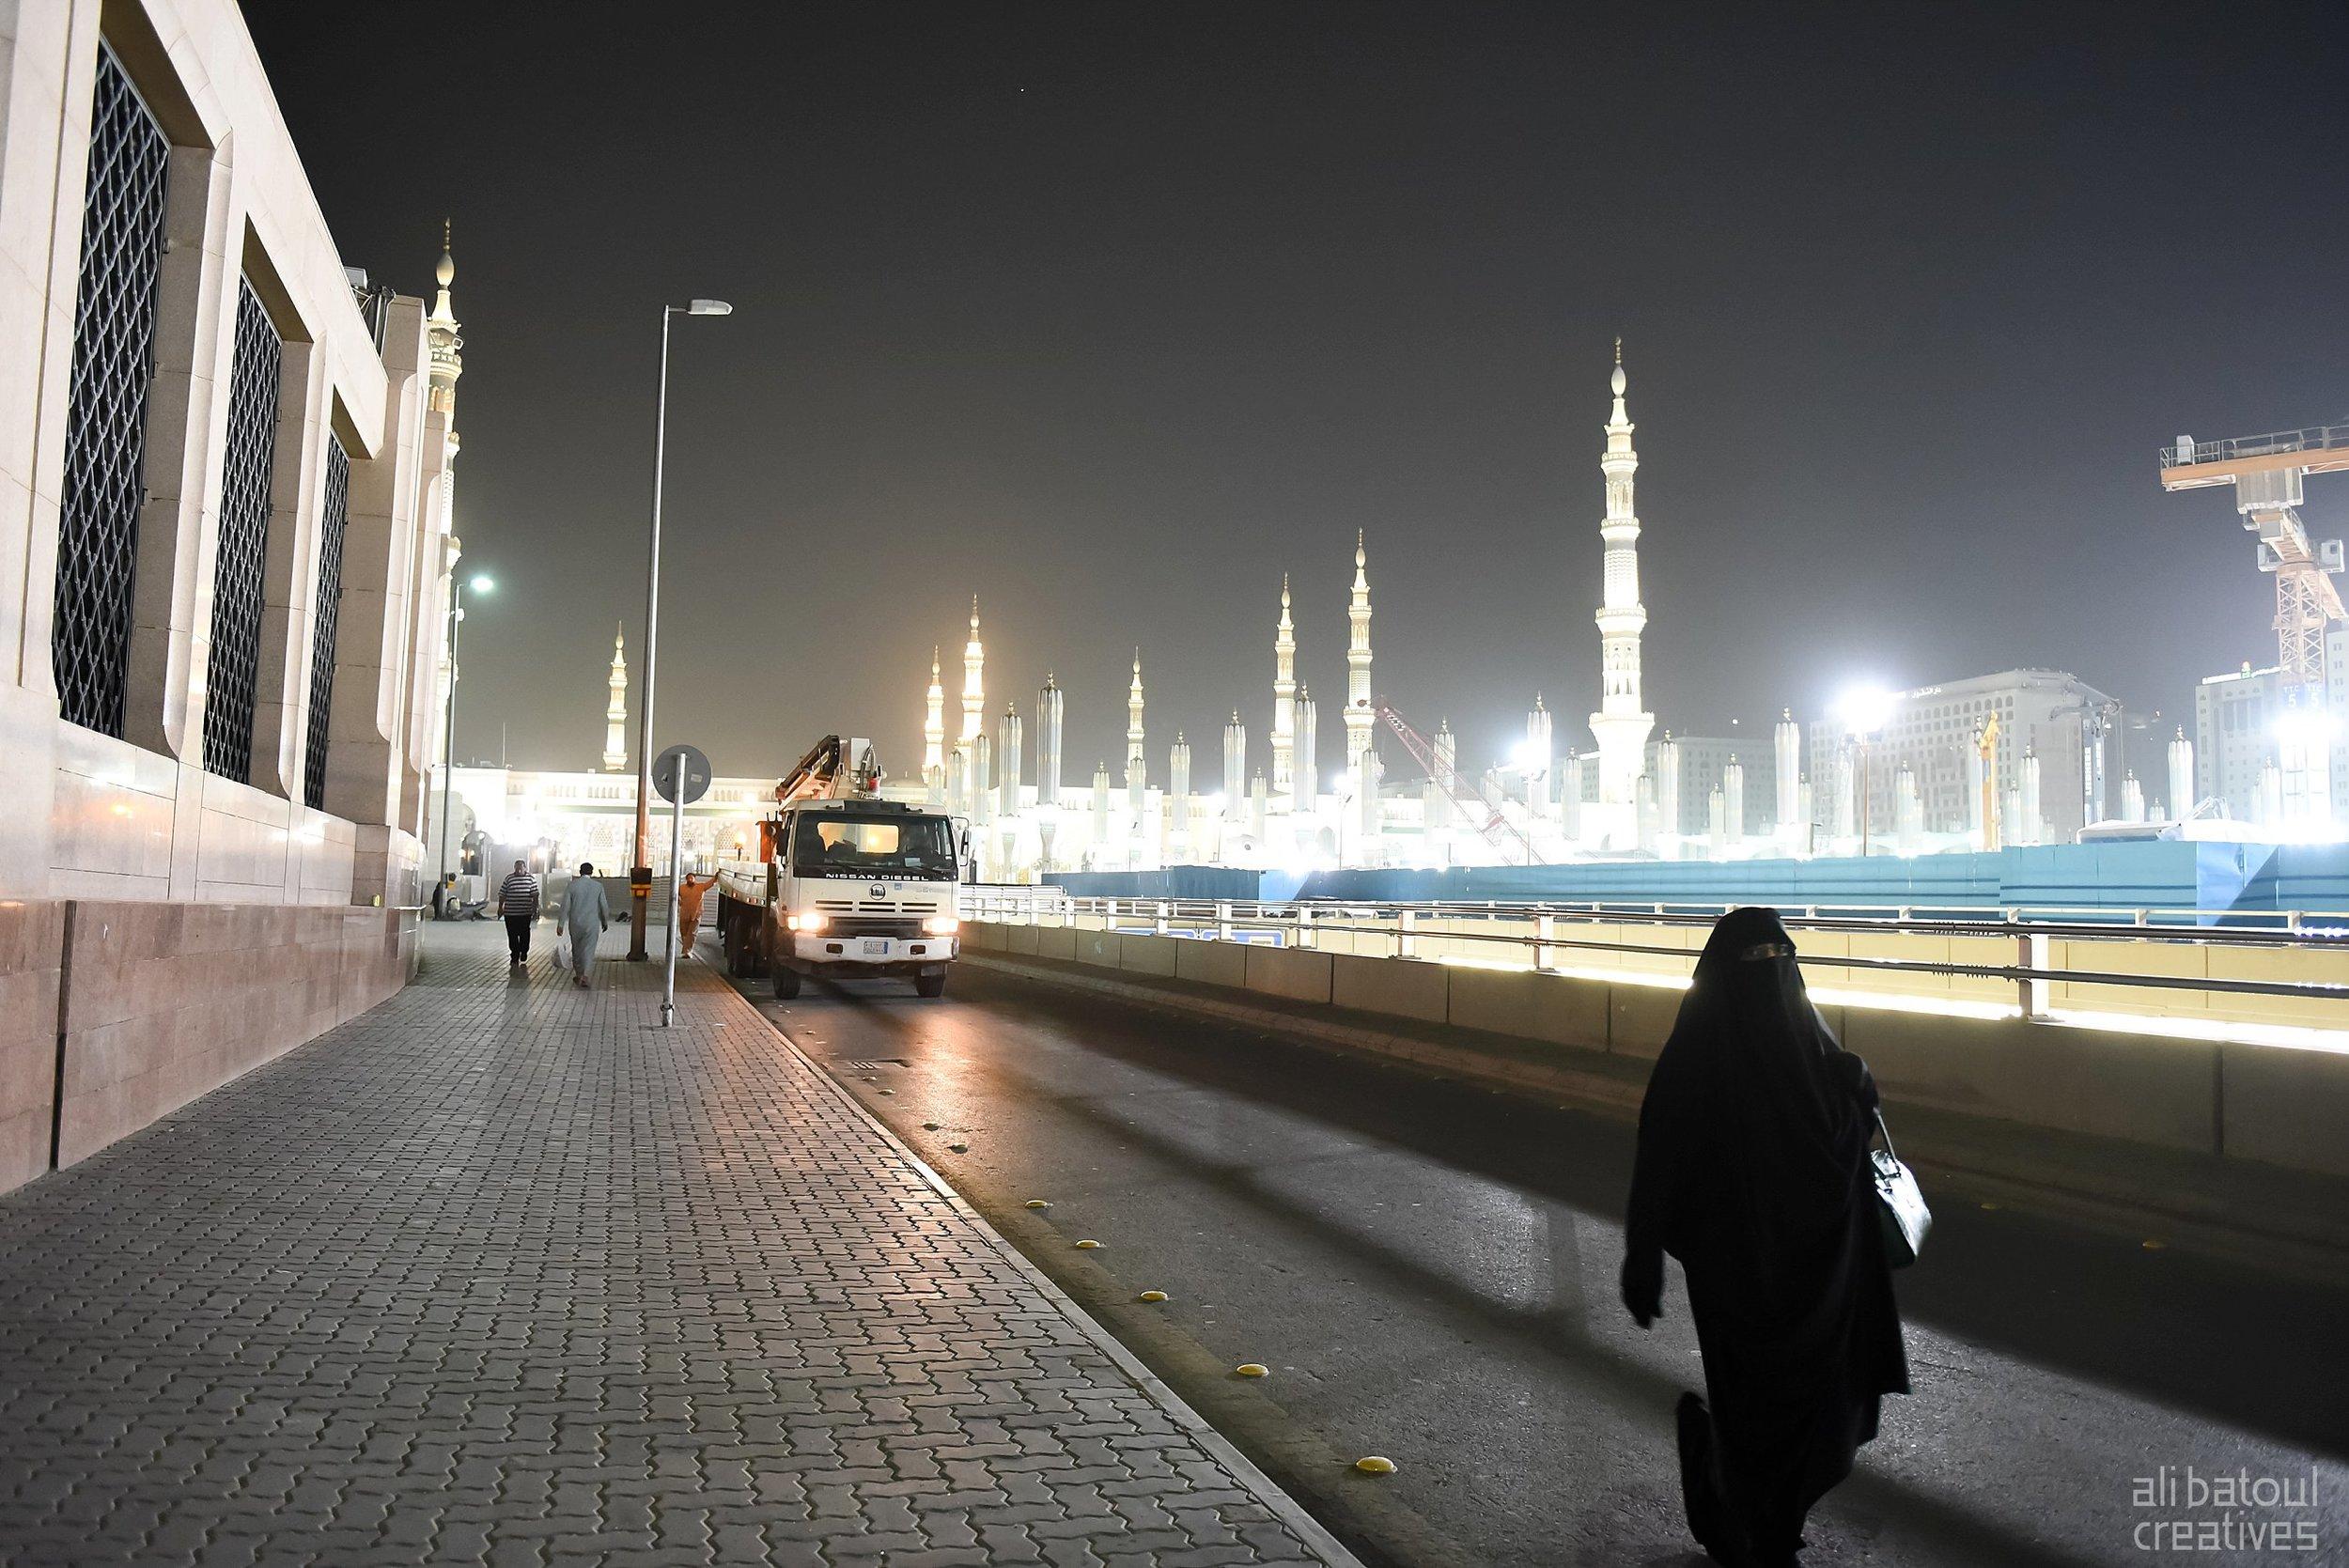 Umrah 2015 (Medina) - Ali Batoul Creatives-14_Stomped.jpg